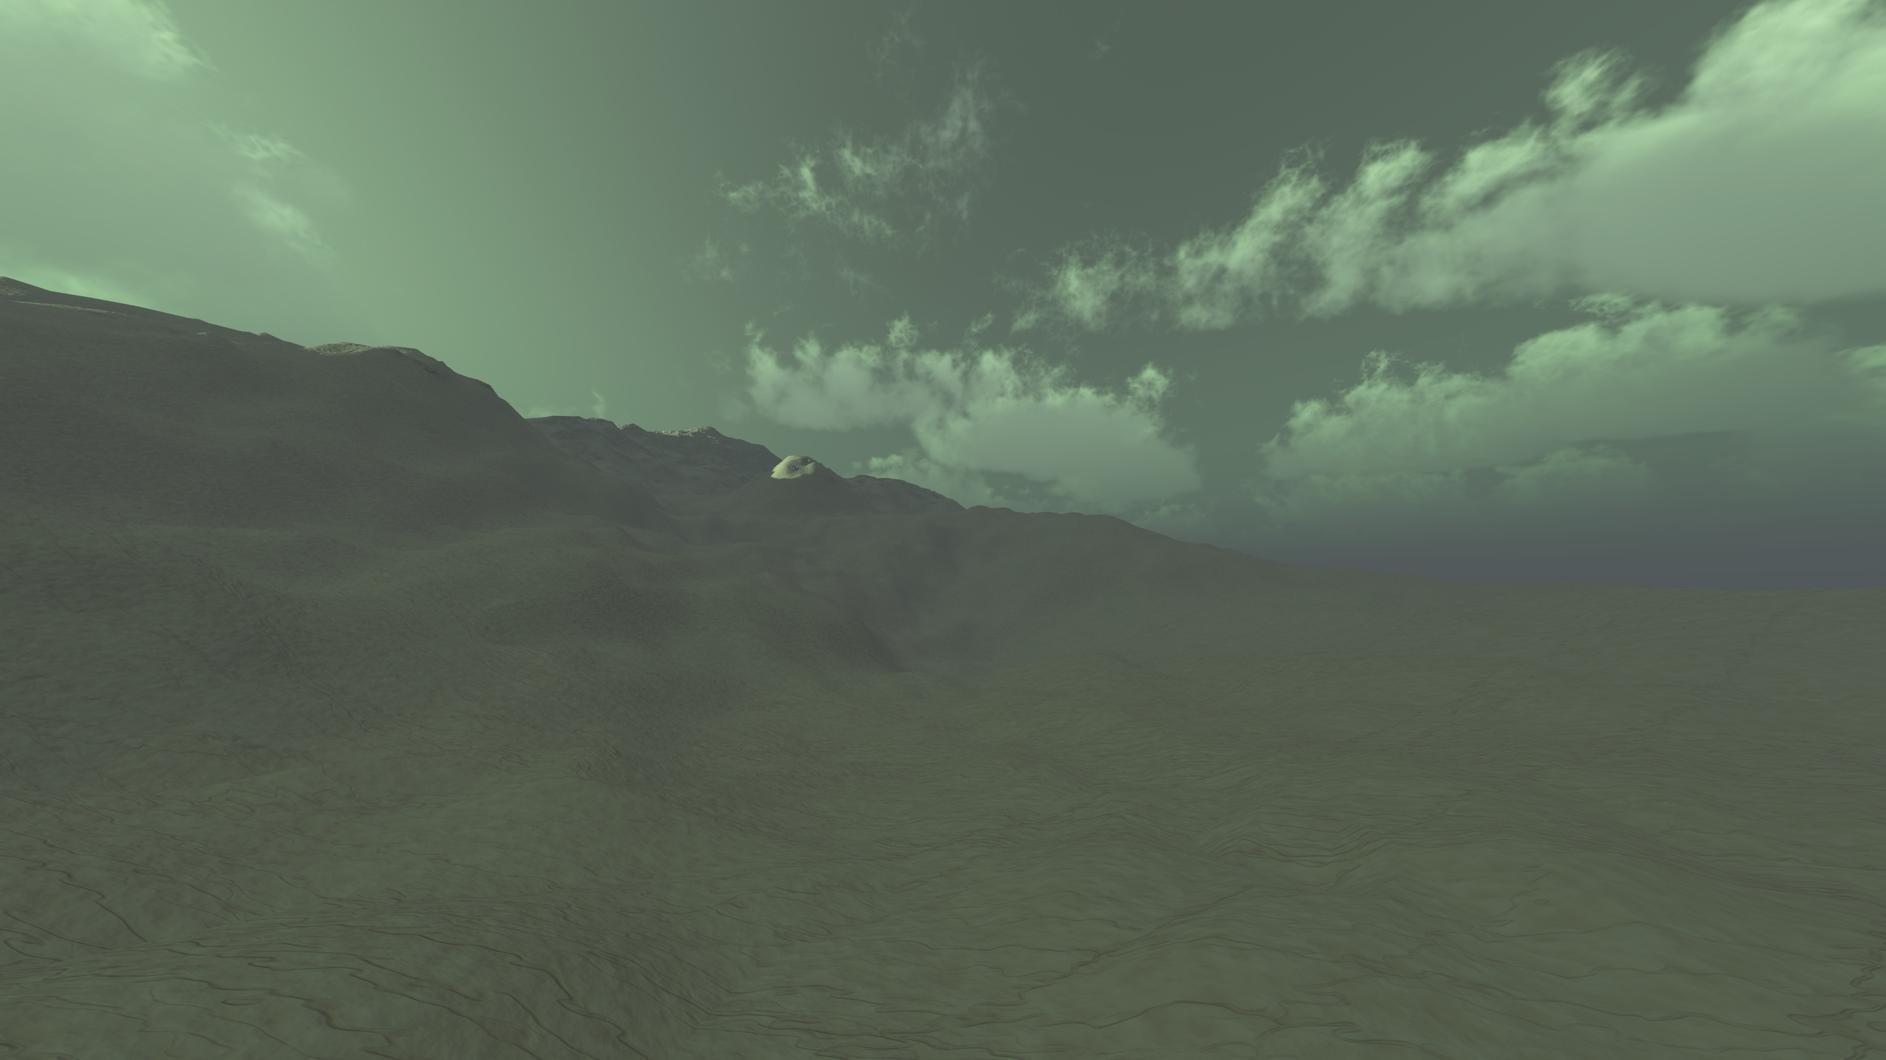 Climb the mountain 7_2.jpg